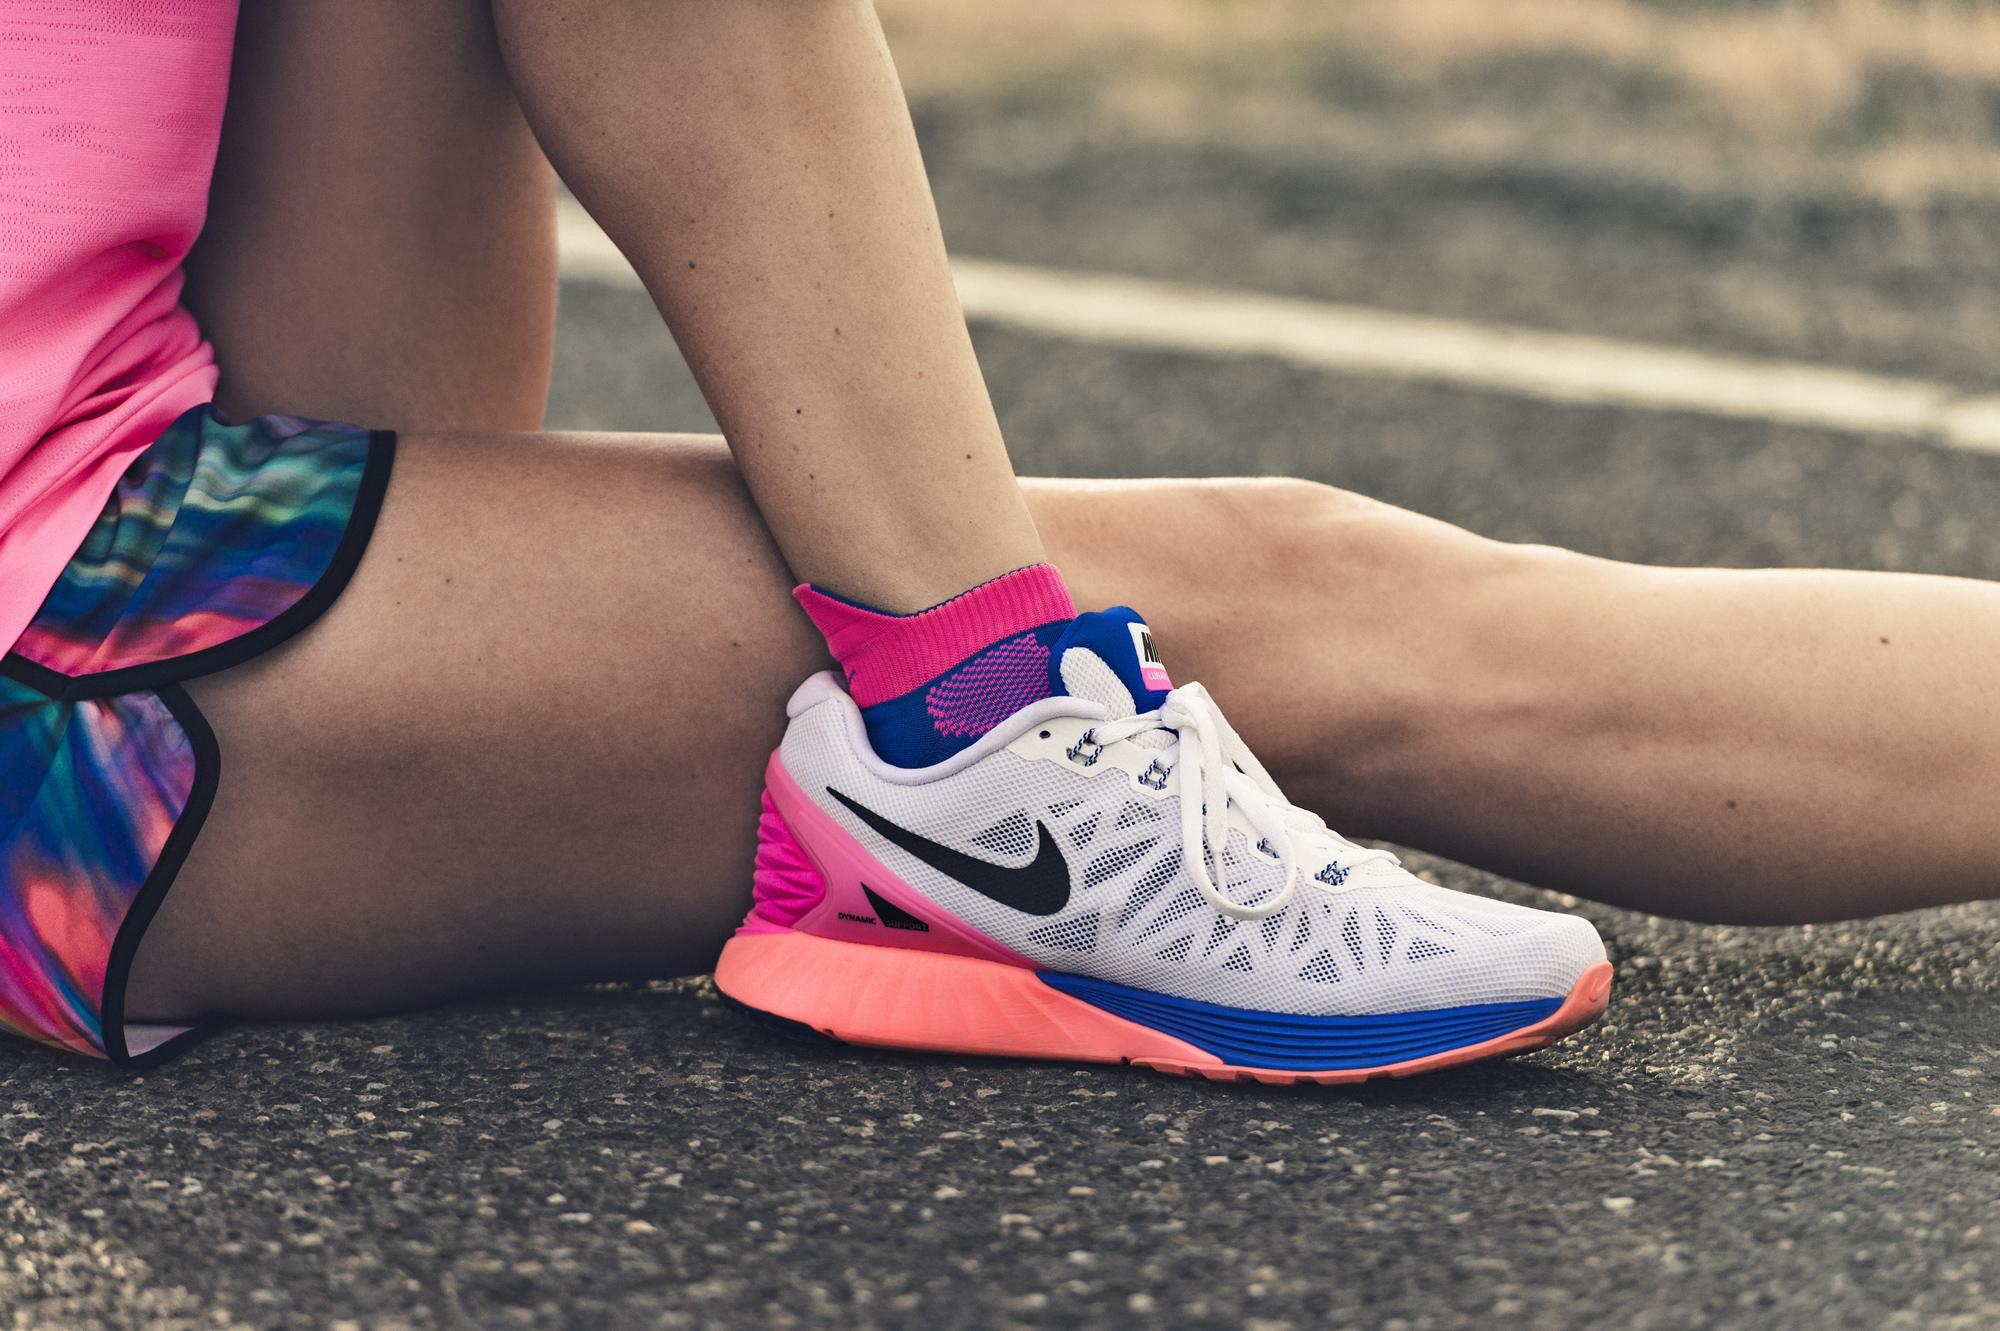 Кроссовки на ноге